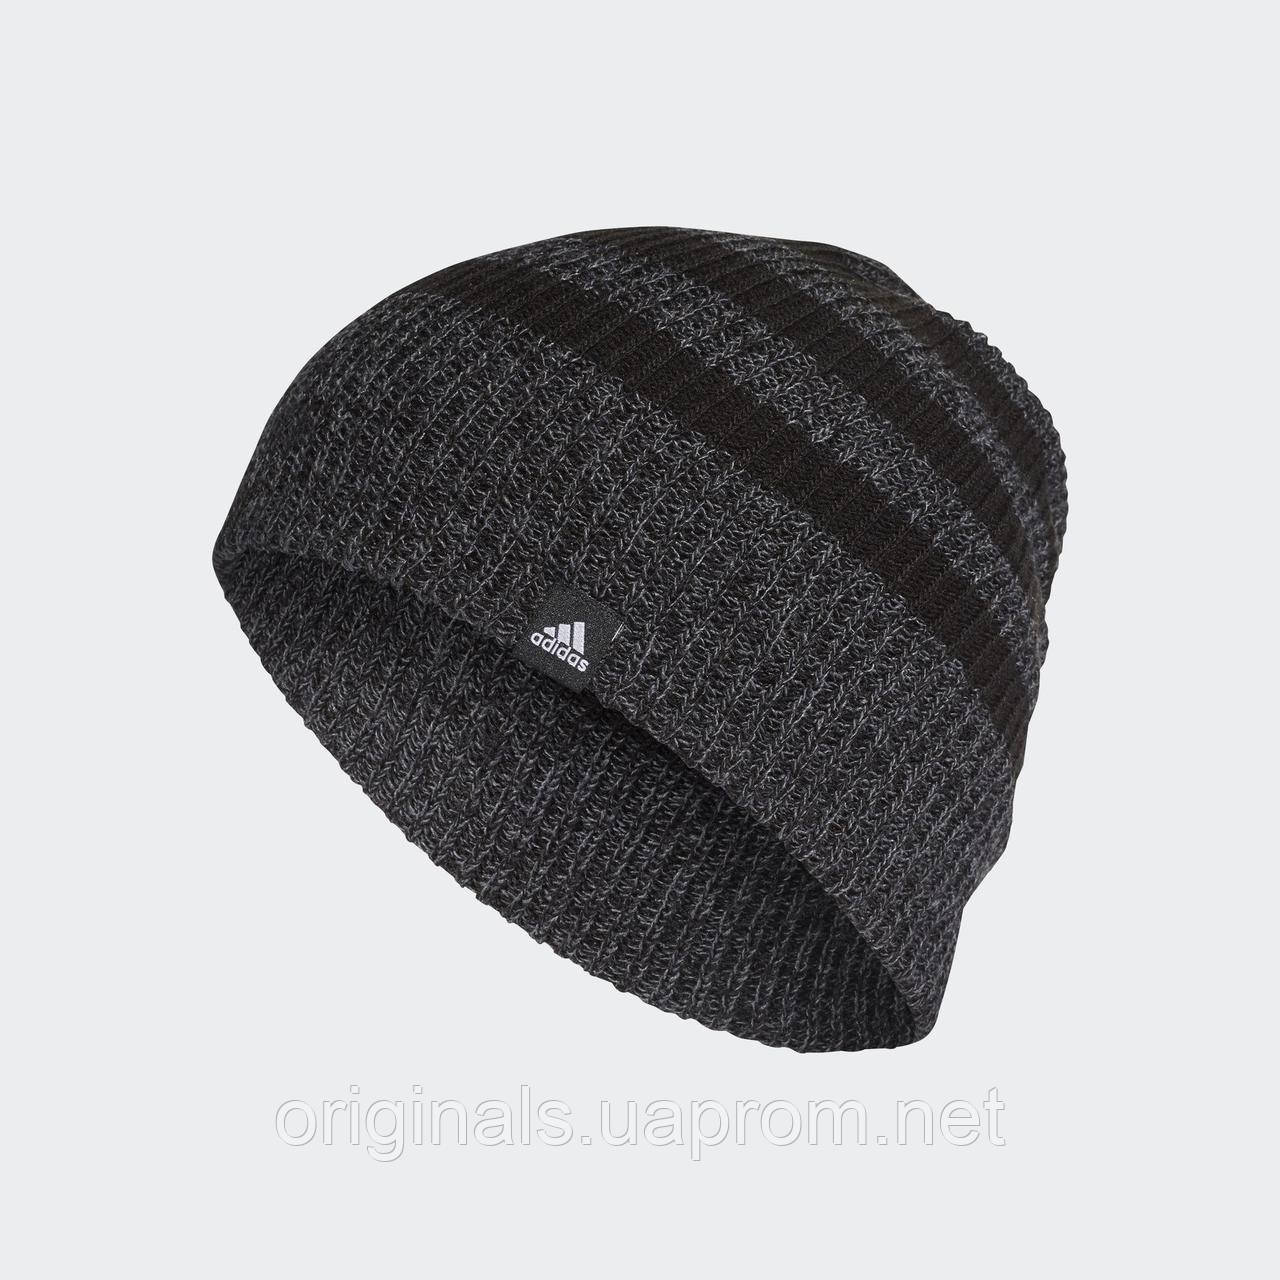 Шапка-бини Adidas 3-Stripes Beanie BR9927